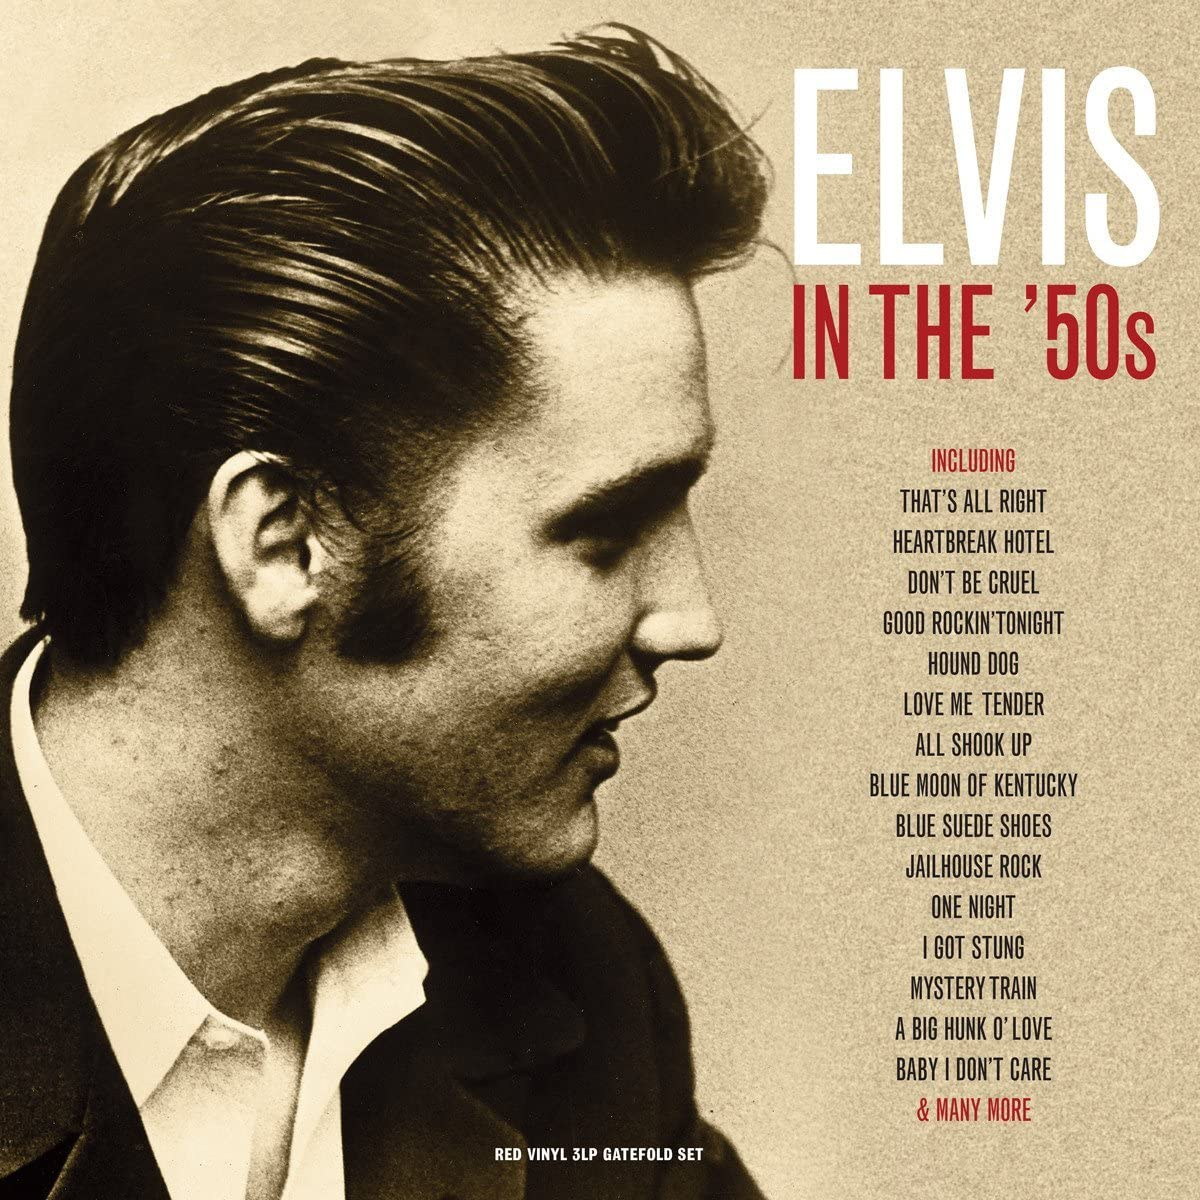 Elvis In The '50s - Red Vinyl